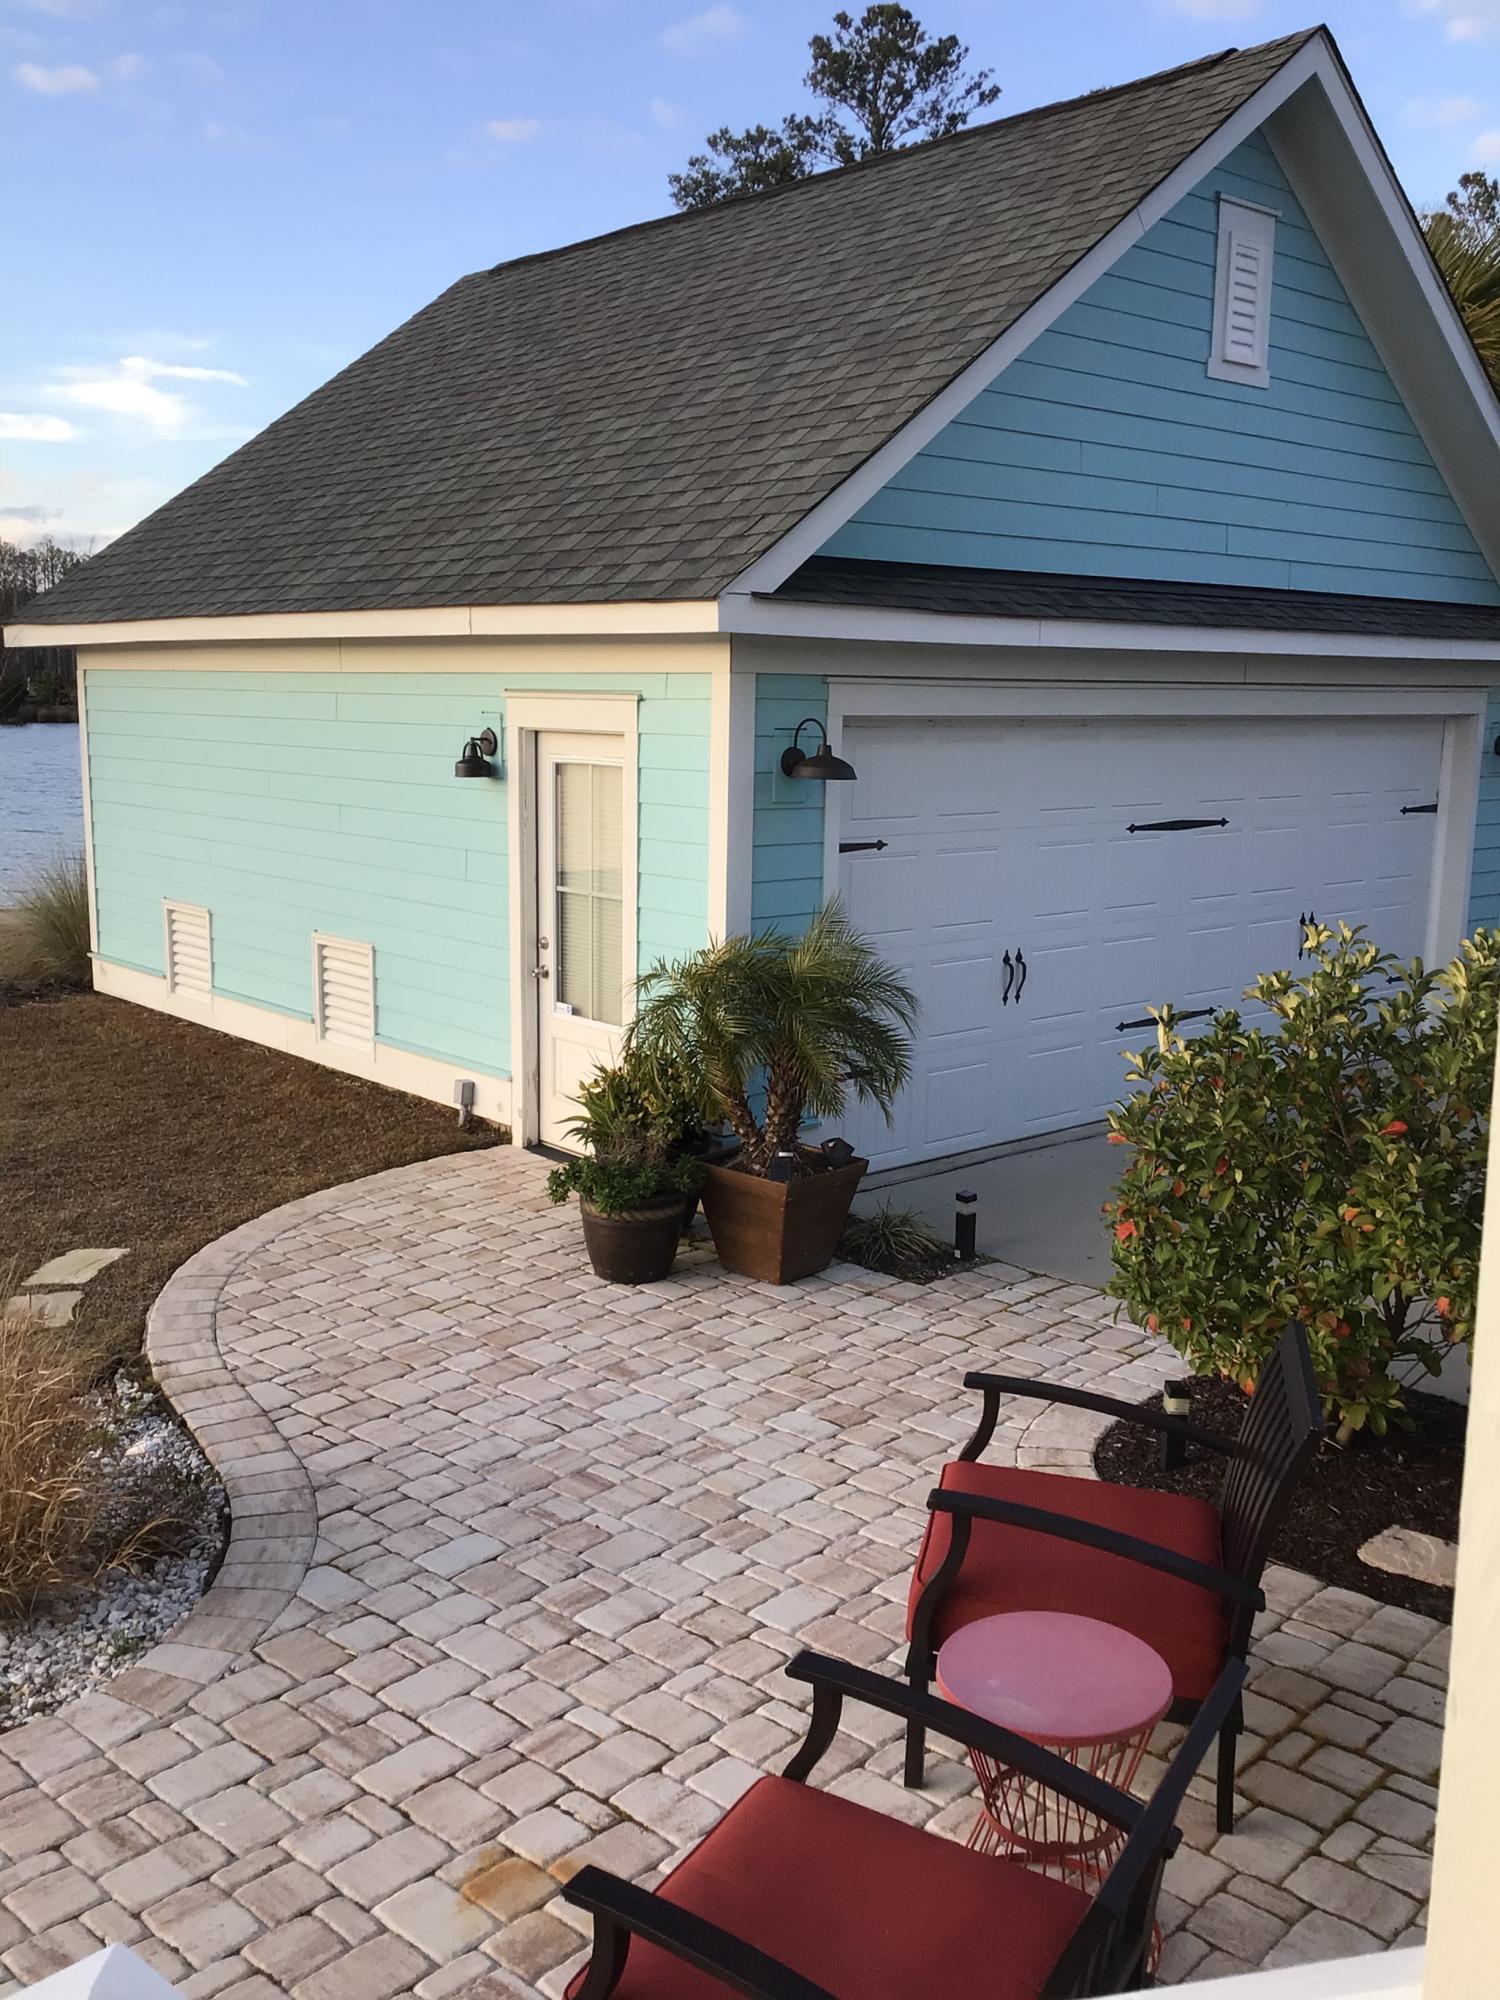 Carolina Park Homes For Sale - 1555 Watt Pond, Mount Pleasant, SC - 7